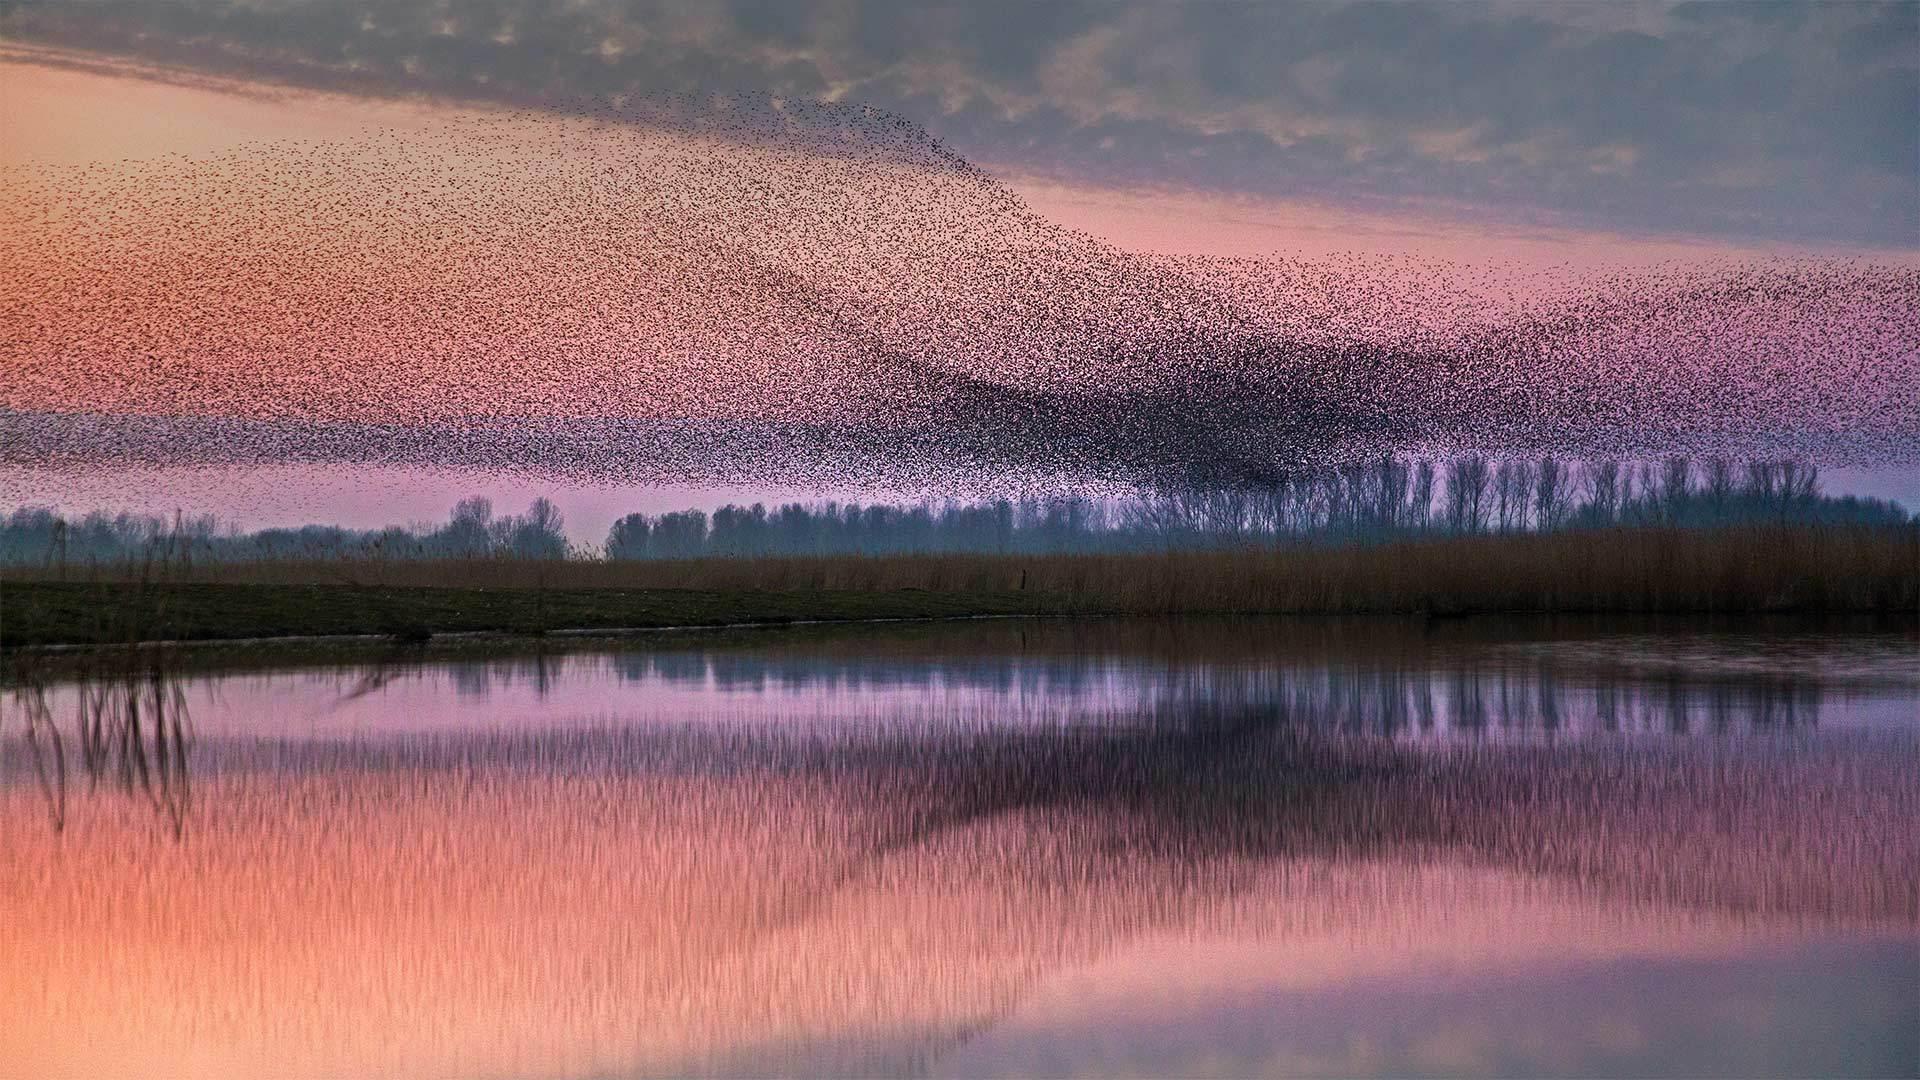 Lauwersmeer国家公园上空的椋鸟群Lauwersmeer国家公园